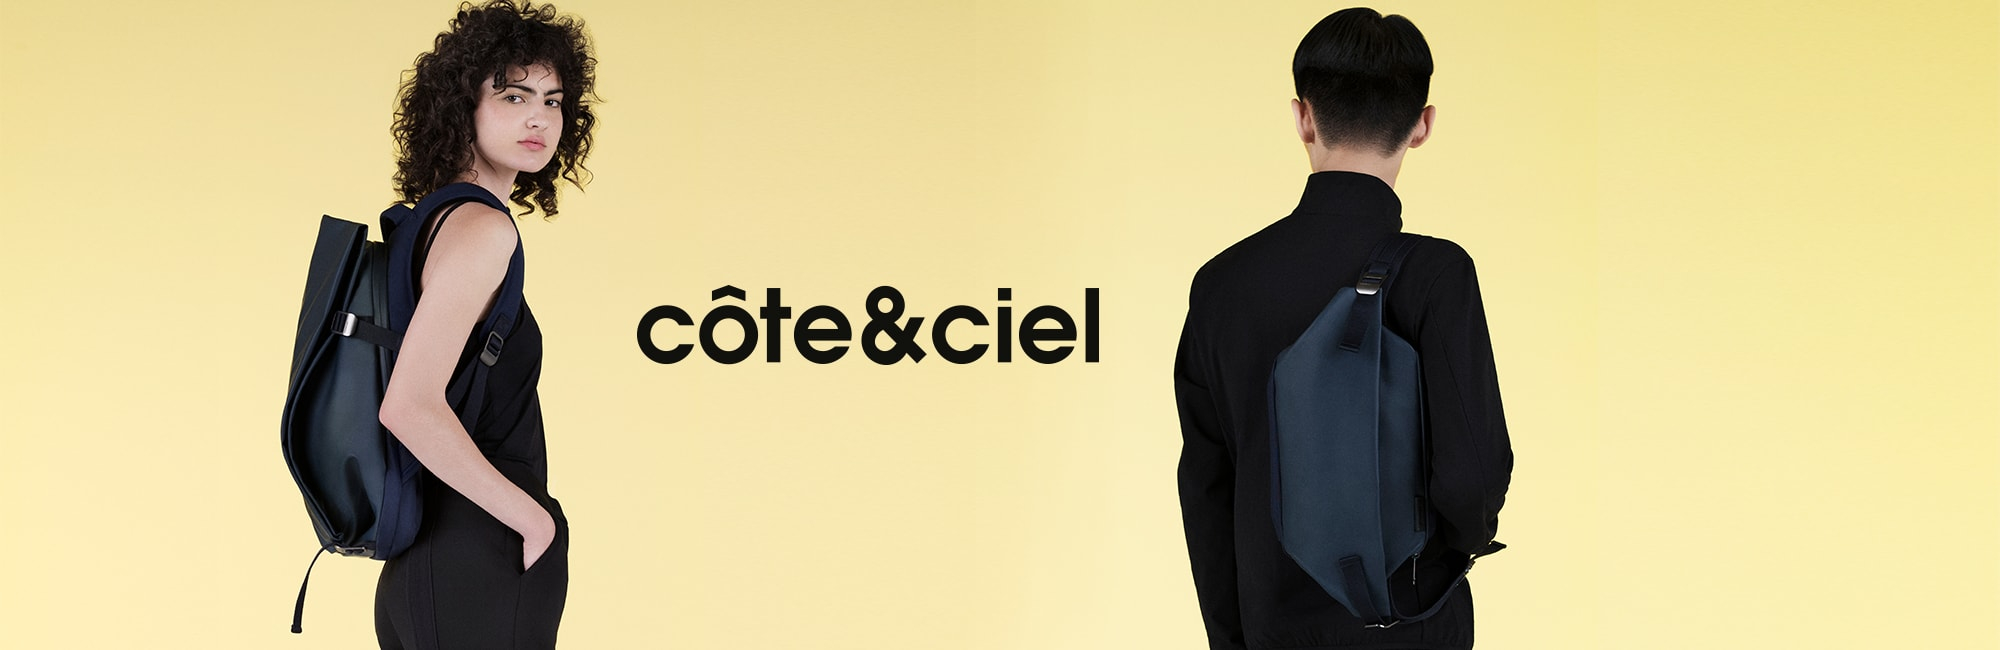 Côte&Ciel